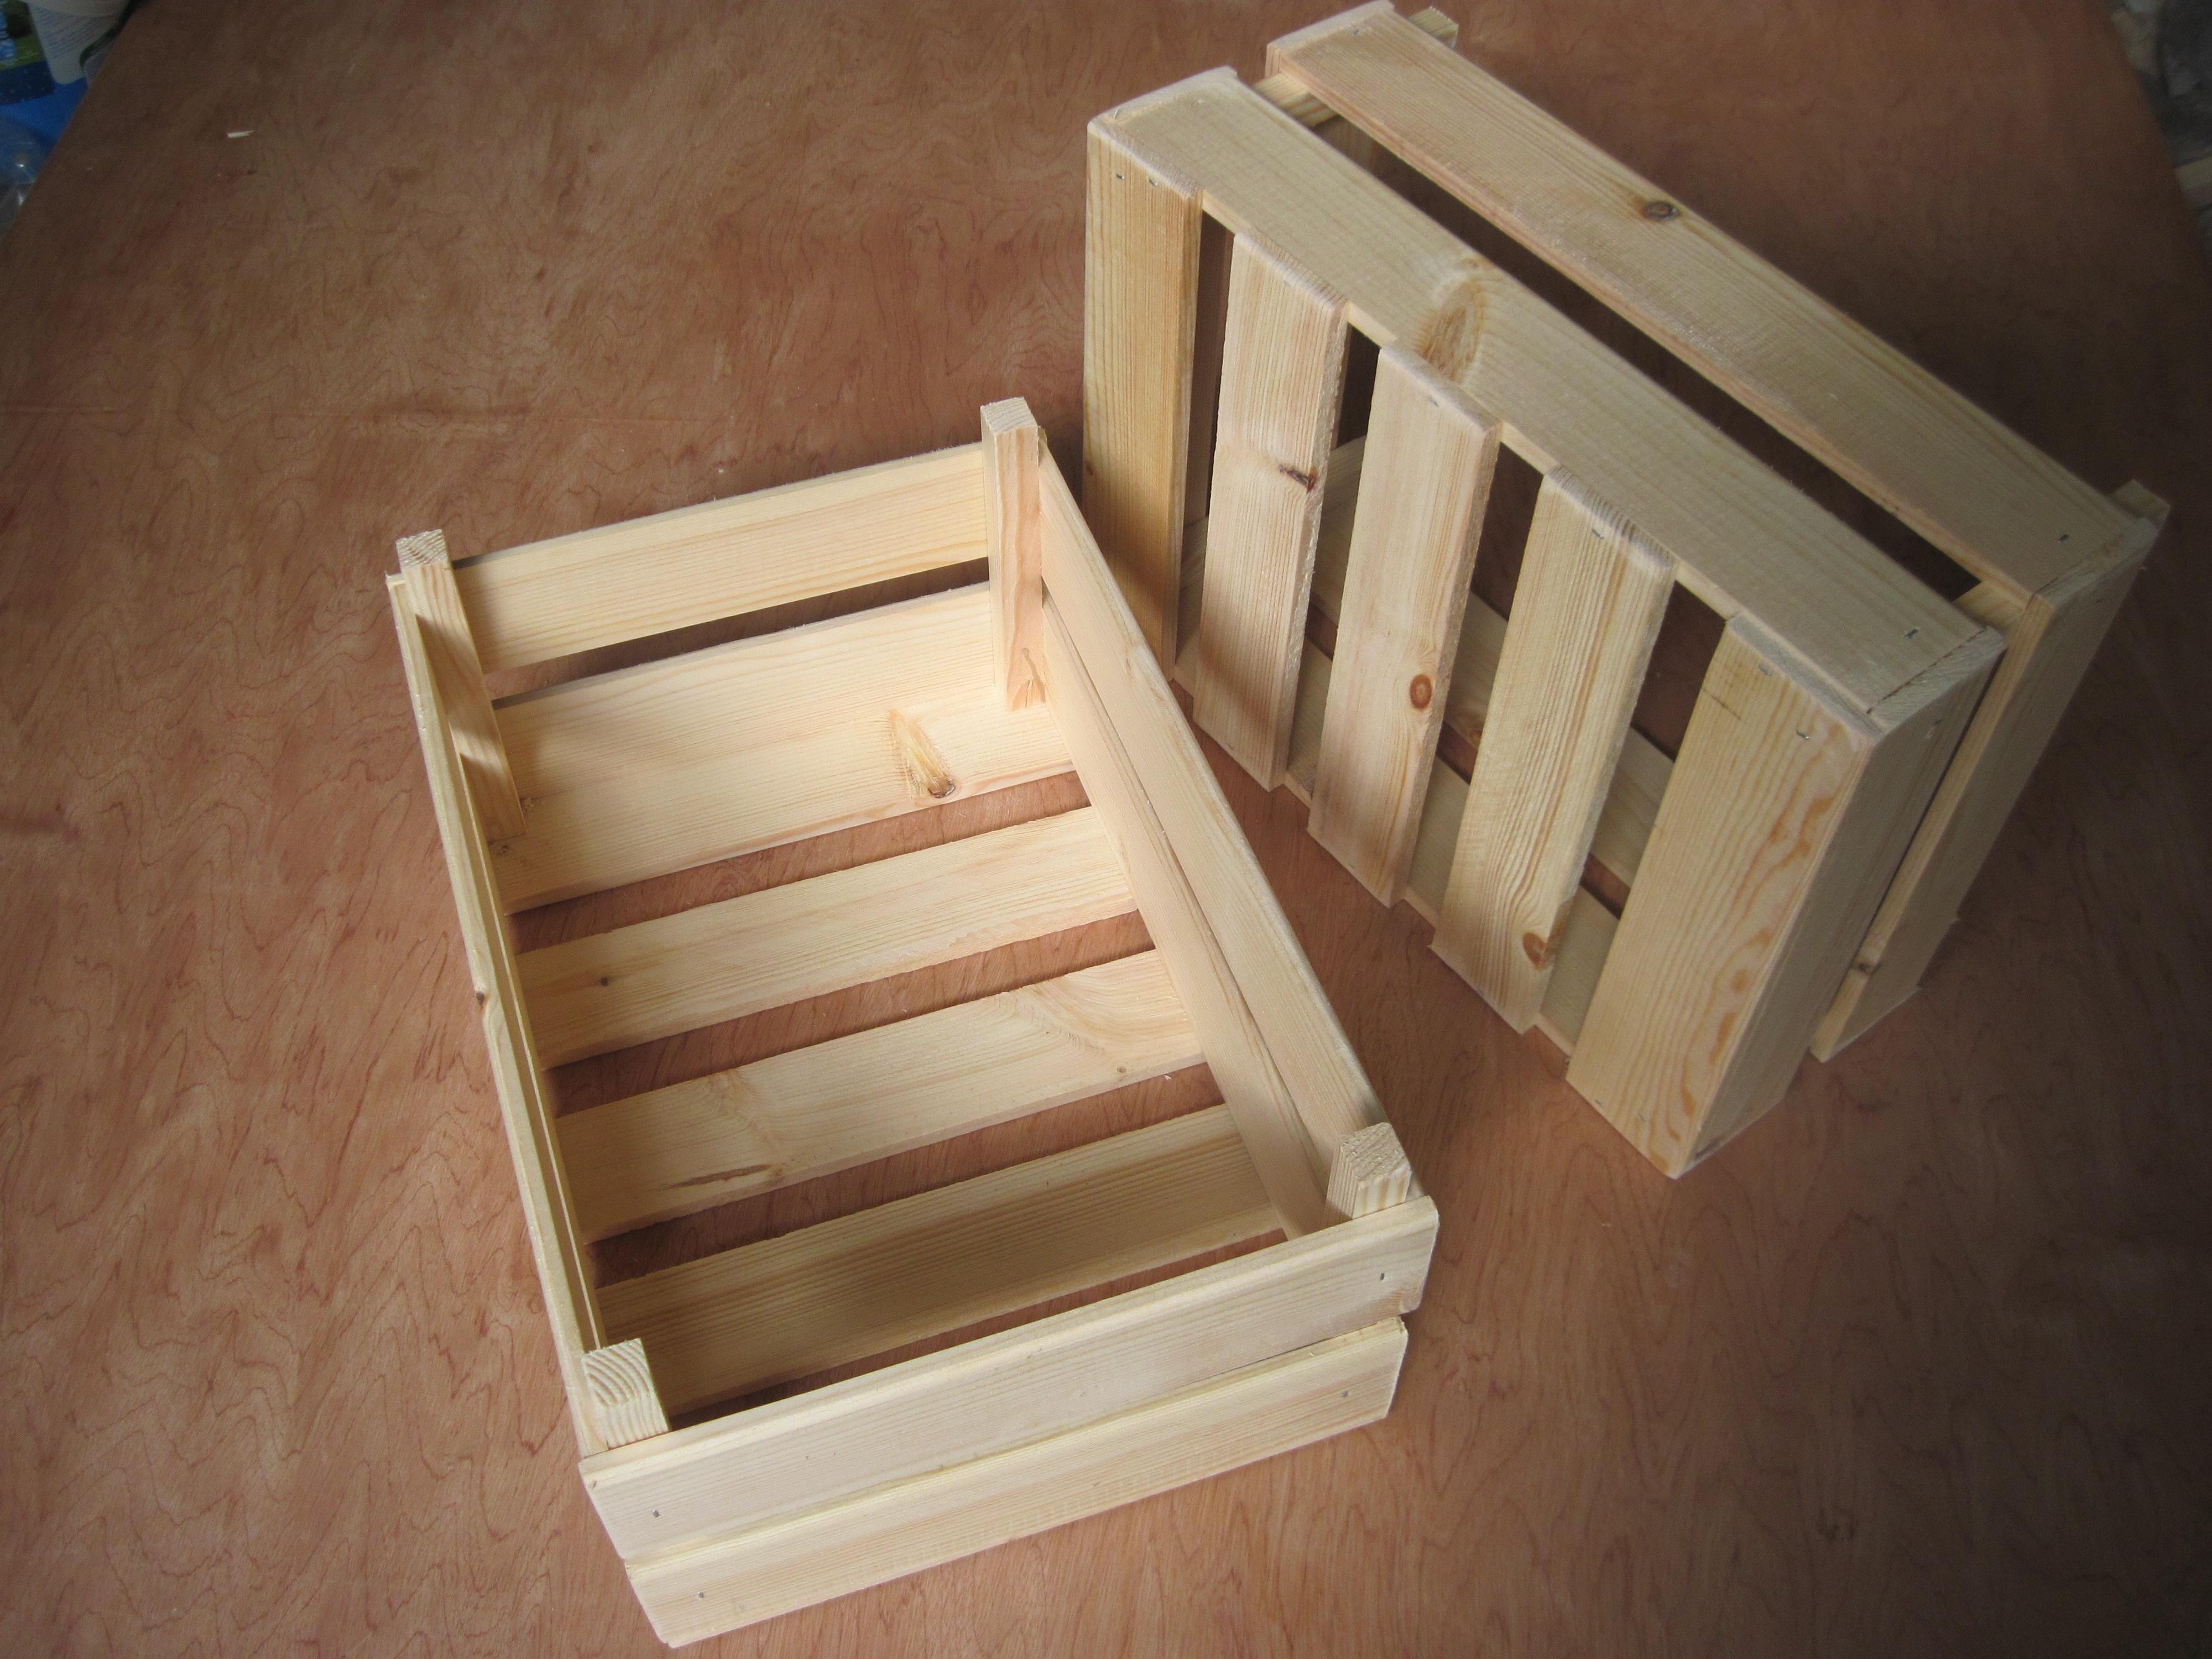 madera pino regalo decoracin estante caja mueble decoracin caja cajn producto de madera diy caja de